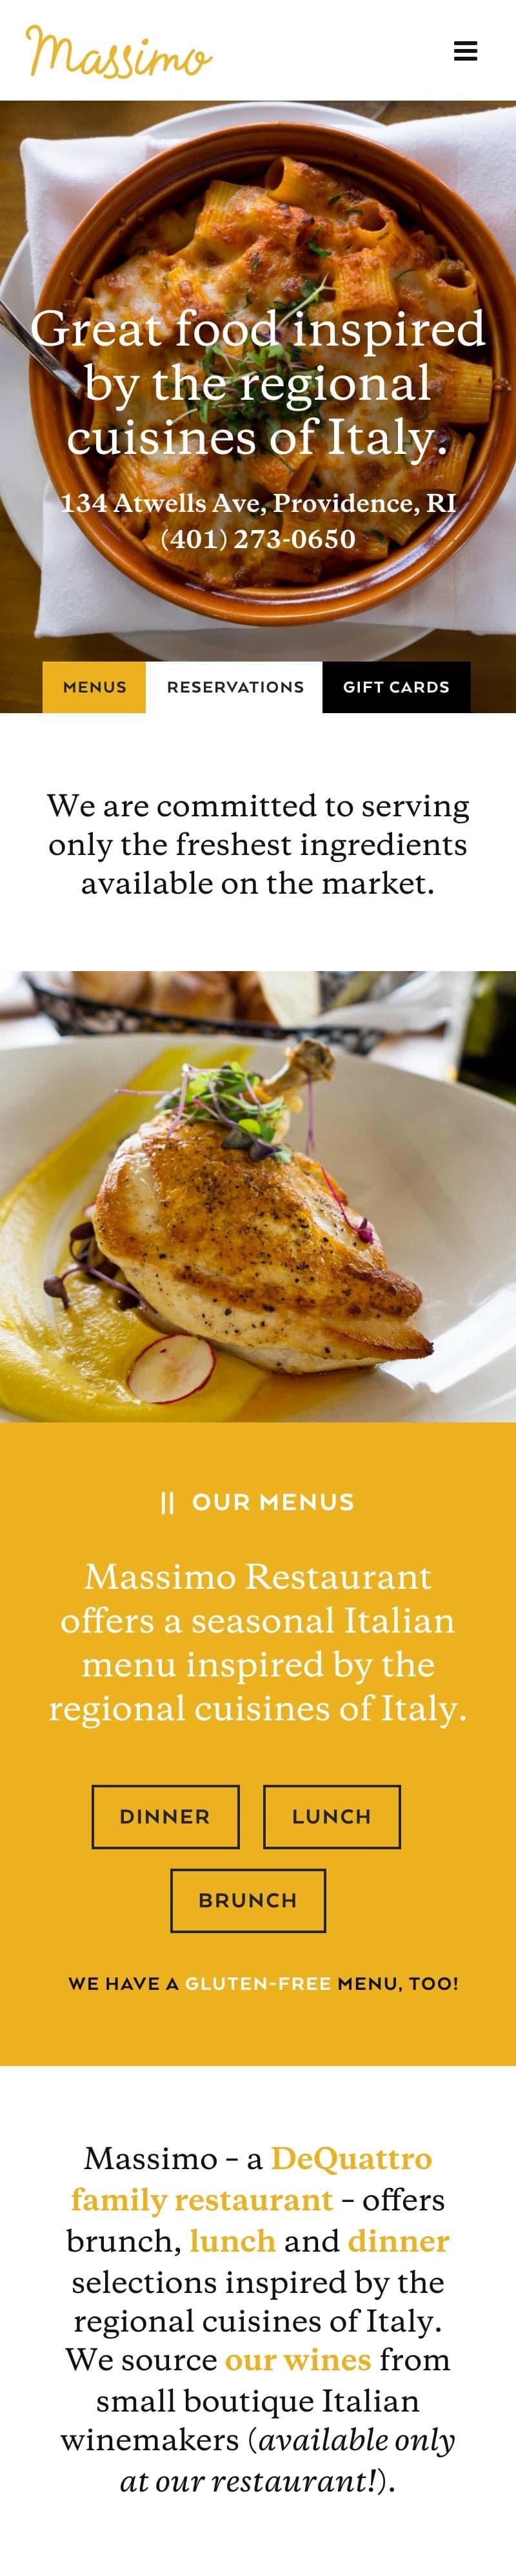 Responsive mobile Rhode Island restaurant web design